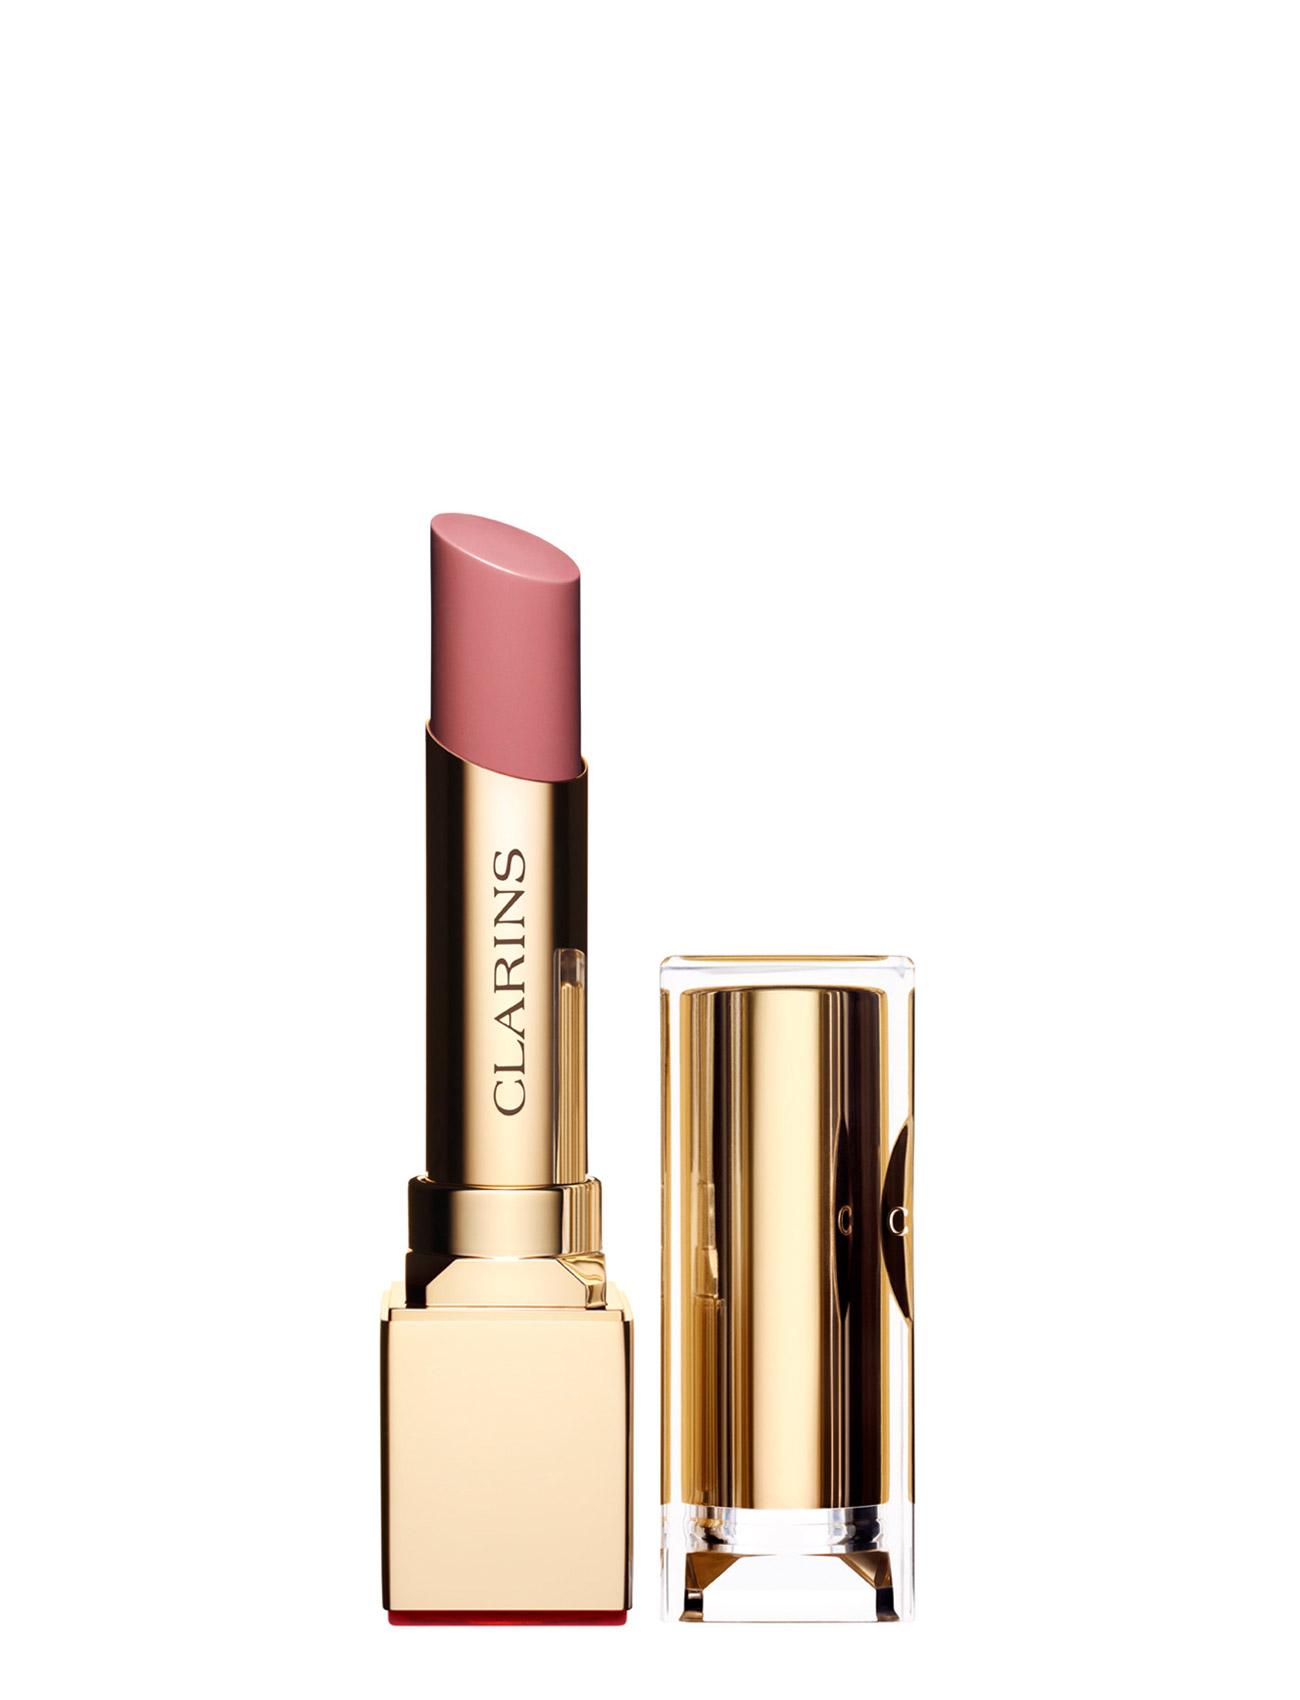 Clarins rouge eclat lipstick 23 hot fra clarins på boozt.com dk